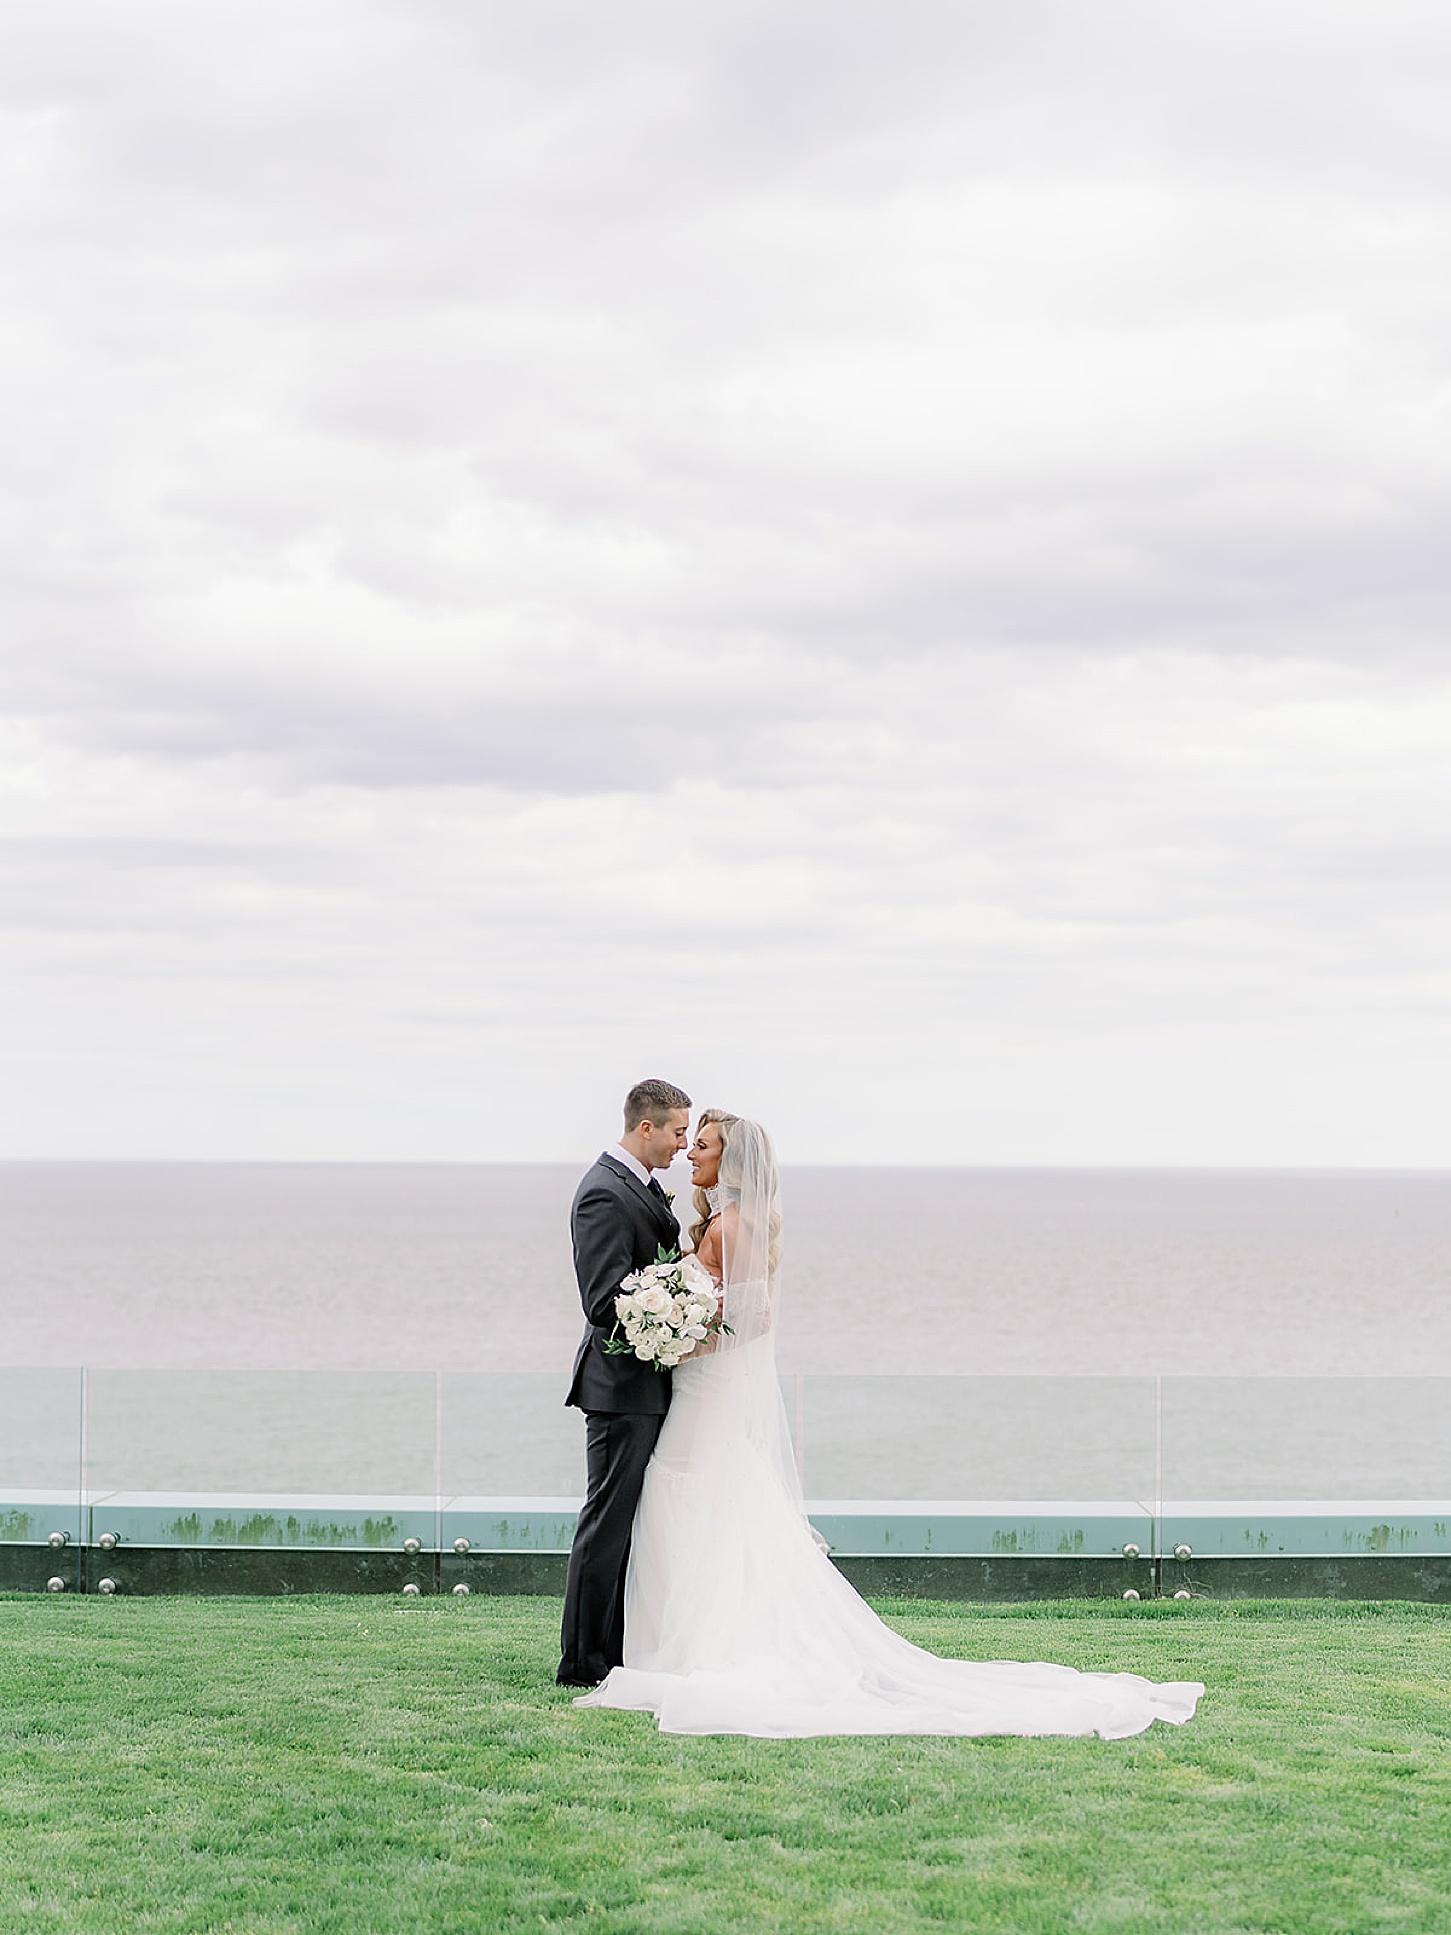 Atlantic City Wedding Photography Studio by Magdalena Studios Lexy Cha 0042